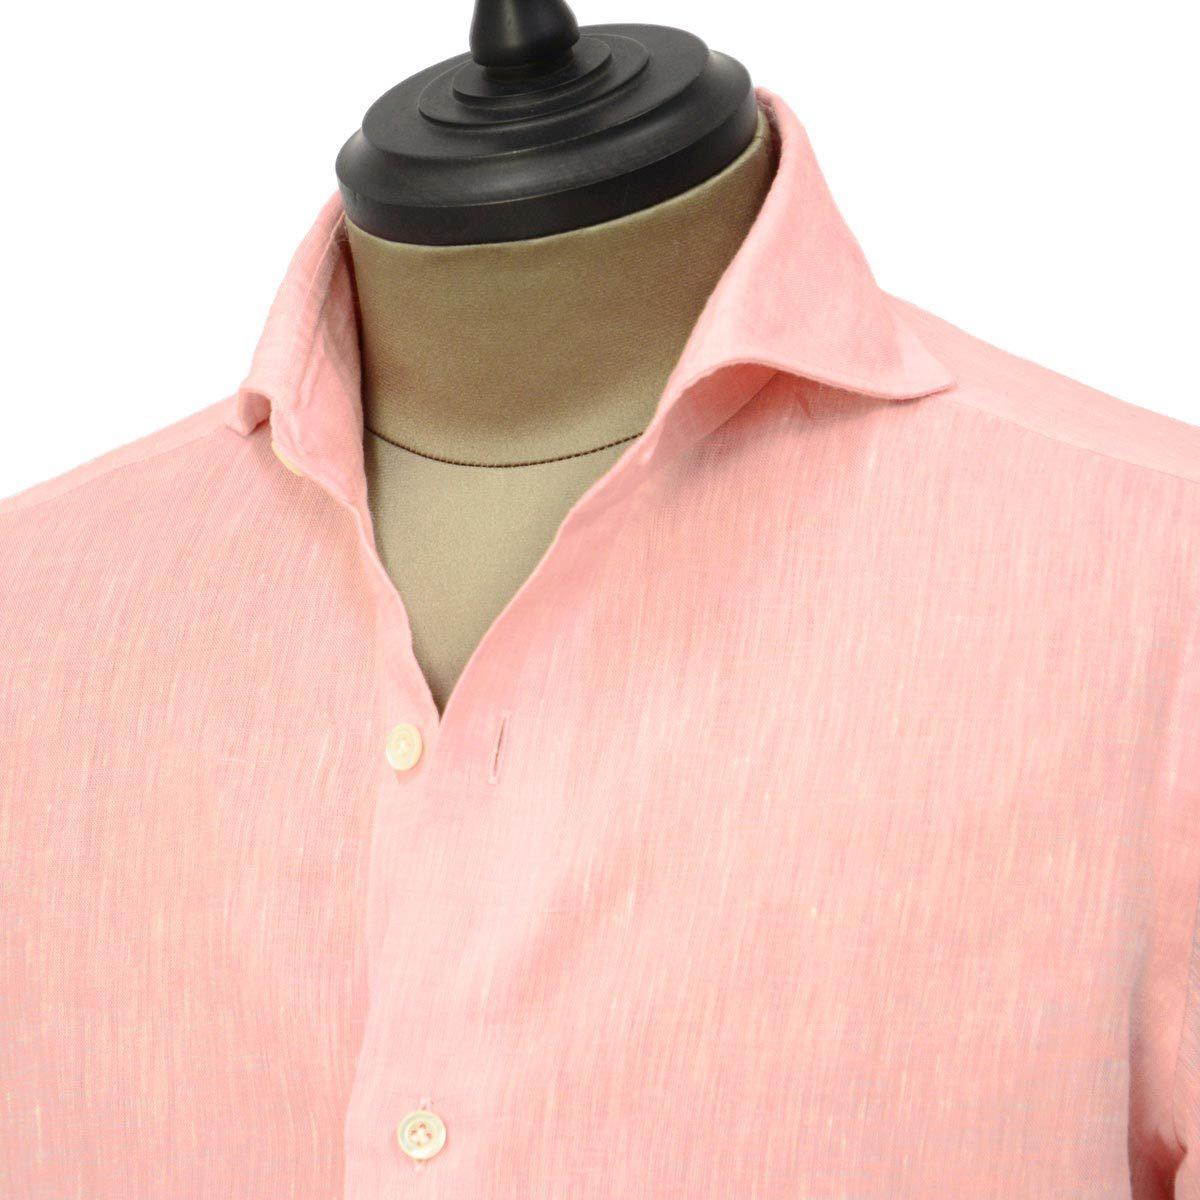 THE GIGI【ザ ジジ】オープンカラーシャツ BELL K914 650 コットン サッカーストライプ ホワイト ブルー